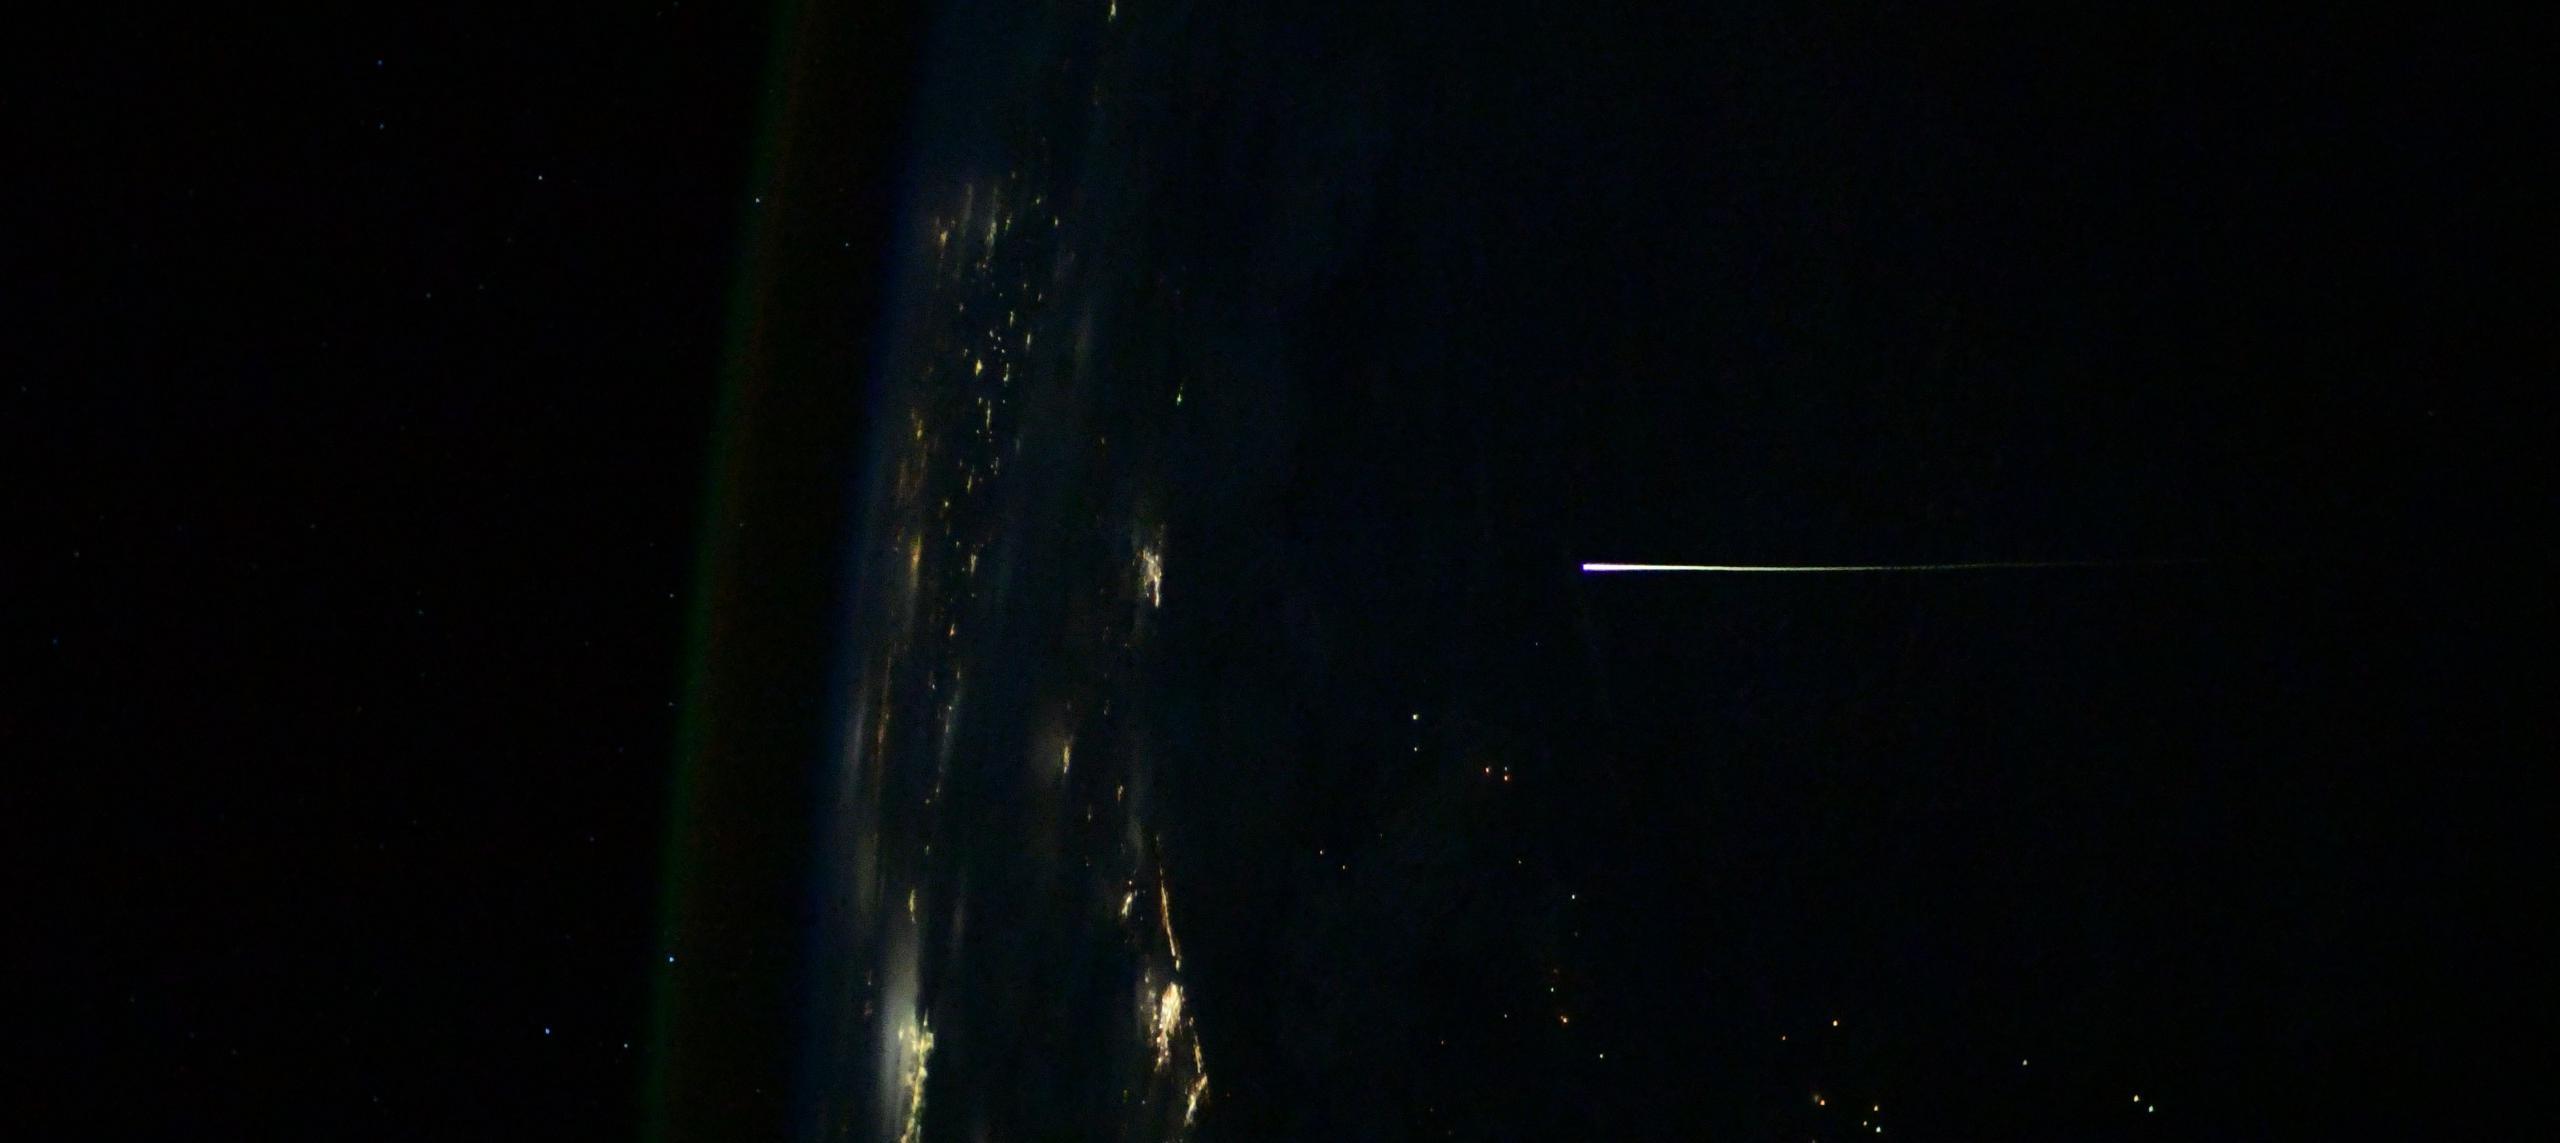 Crew Dragon C207 Crew-1 reentry 050221 (Thomas Pesquet – ESA) 1 crop (c)